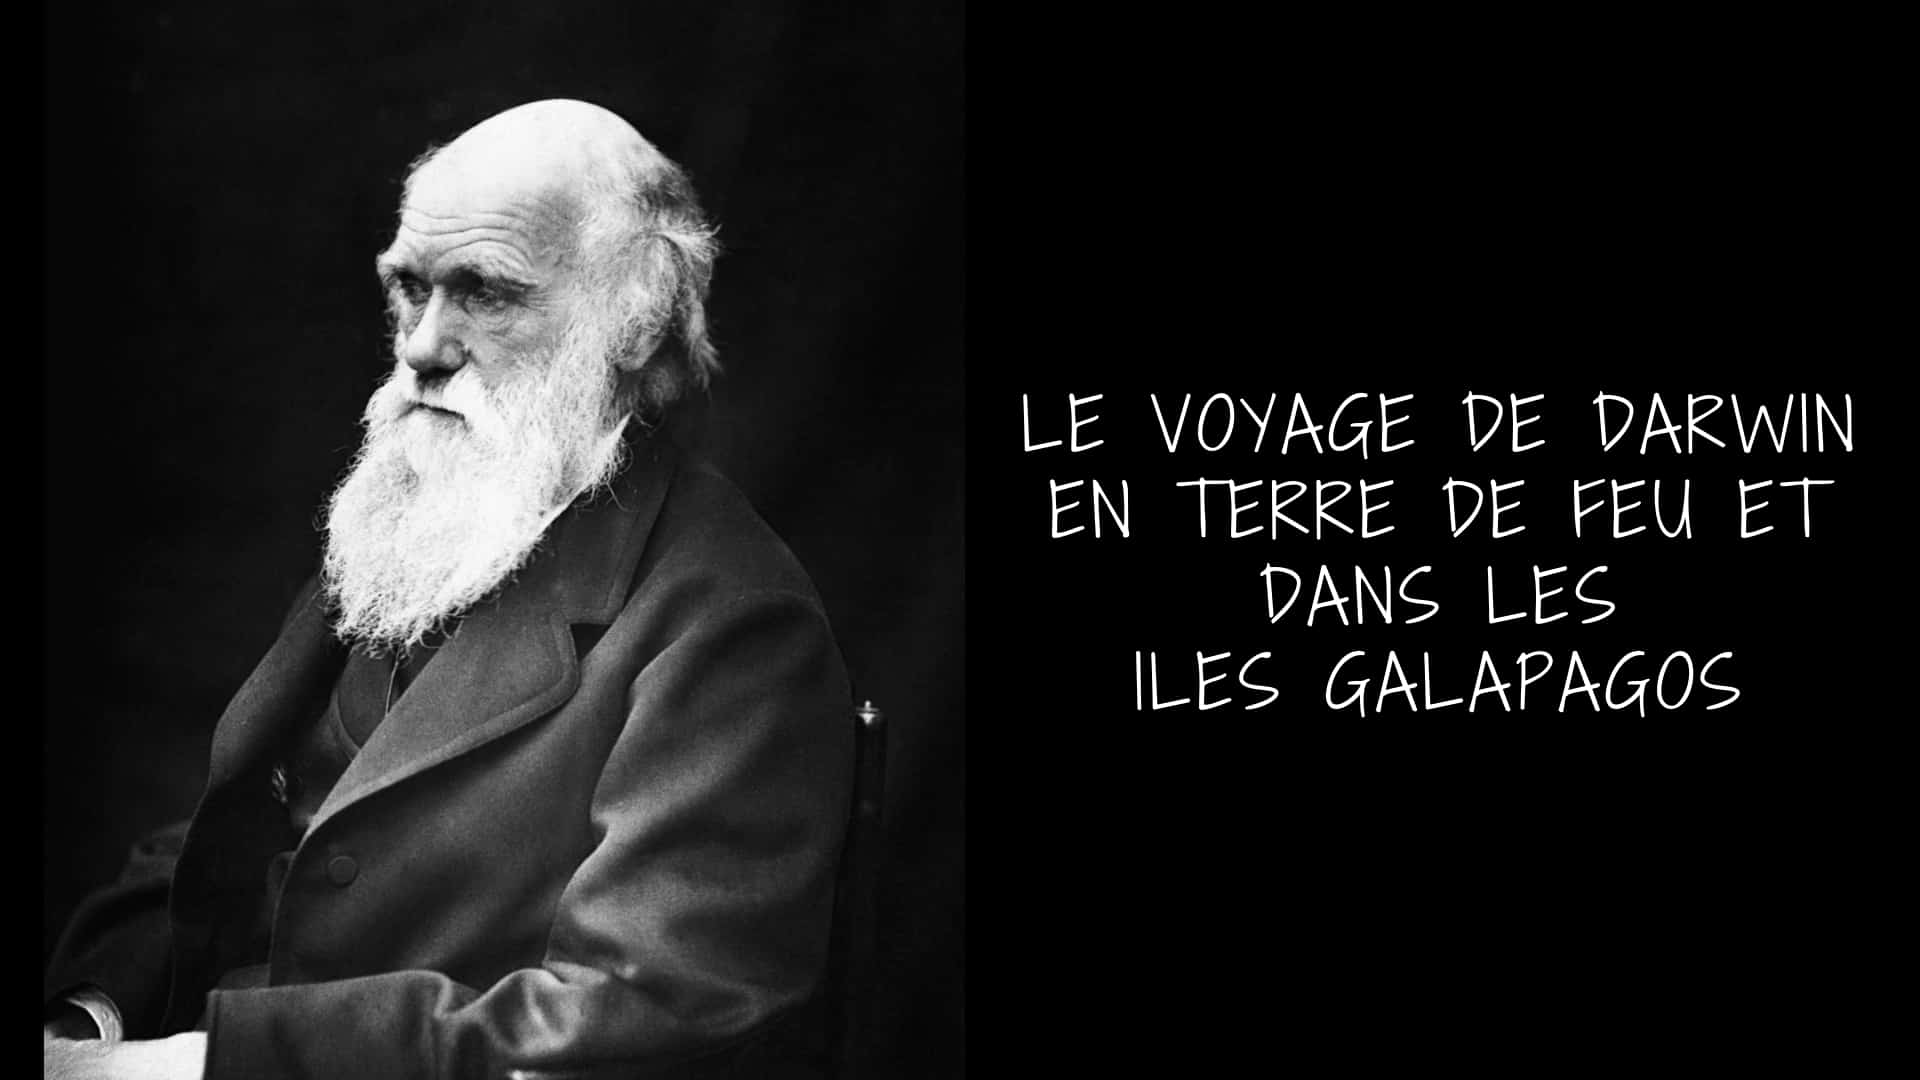 Le Voyage De Darwin En Terre De Feu Et Dans Les Iles Galapagos